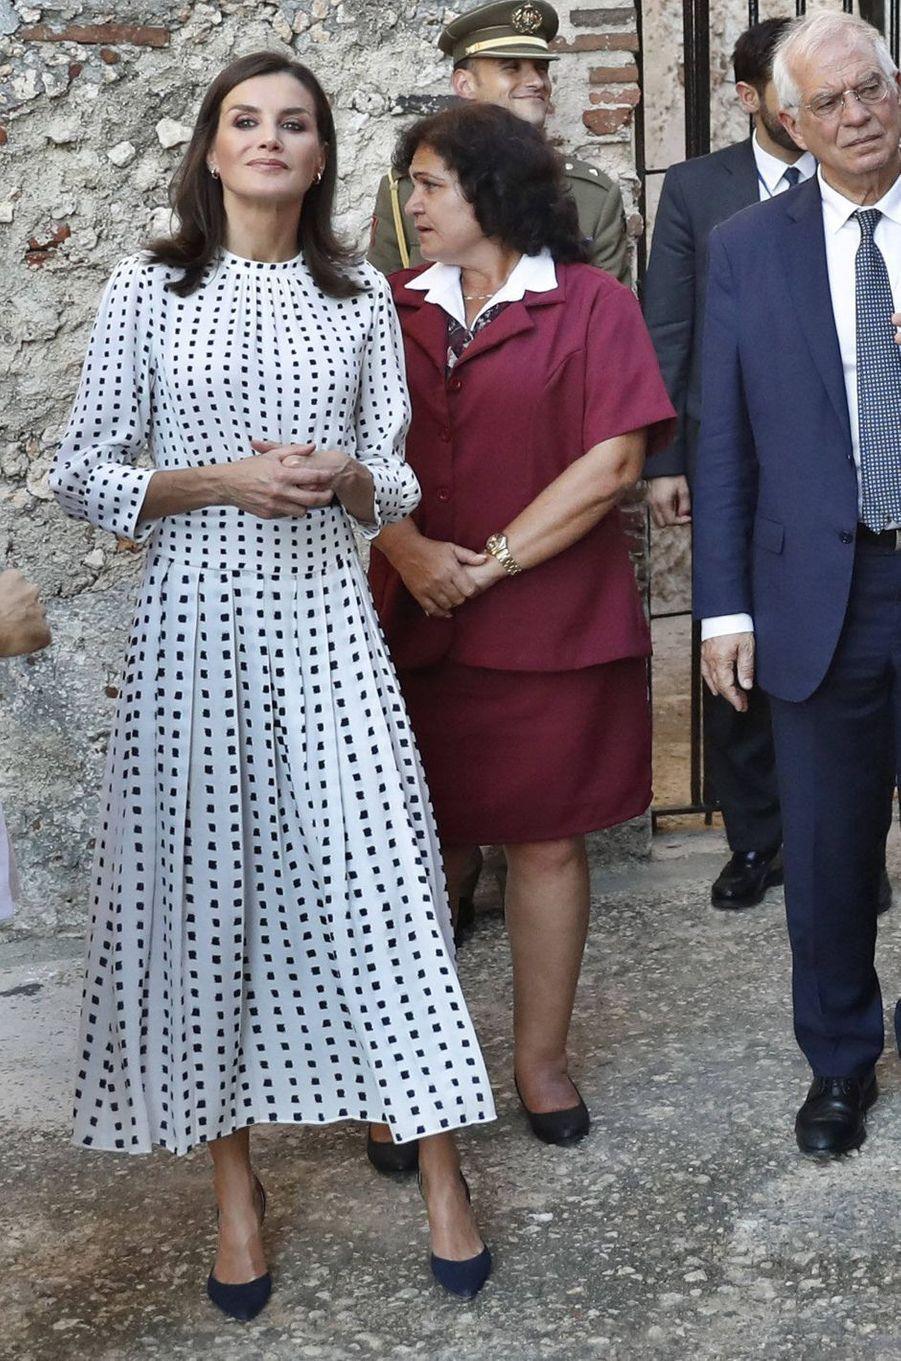 La reine Letizia d'Espagne dans une robe Massimo Dutti à La Havane, le 14 novembre 2019